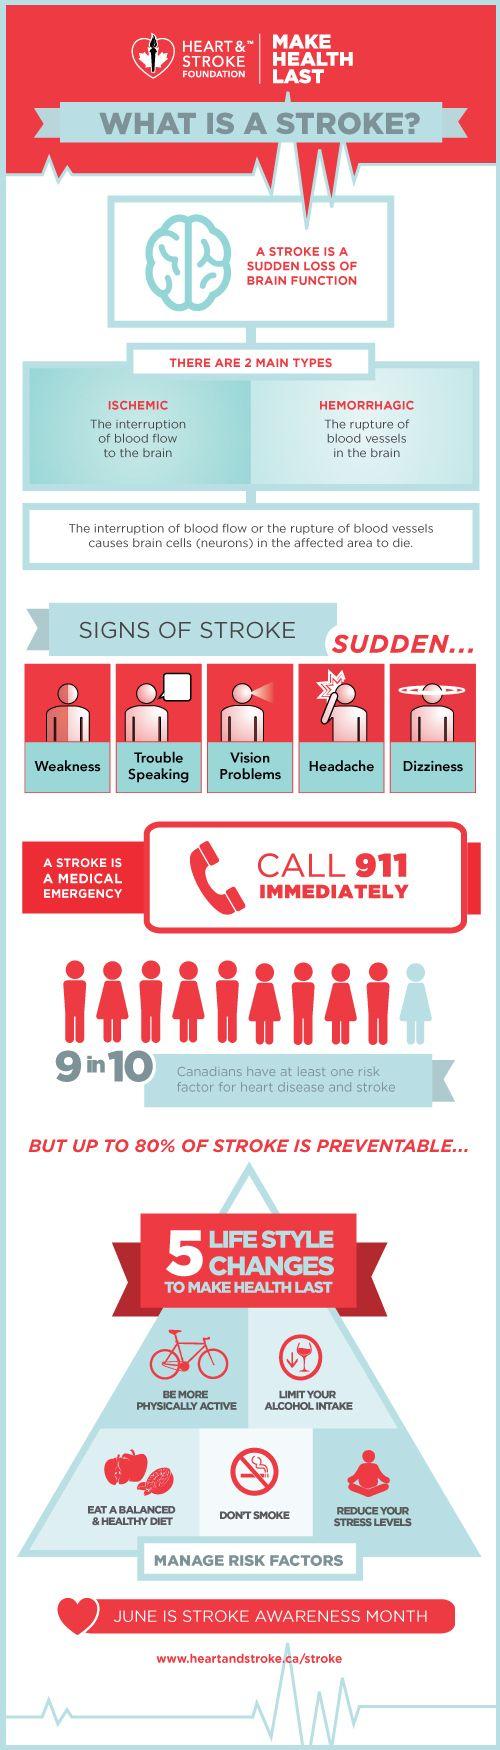 June is stroke awareness month #stroke